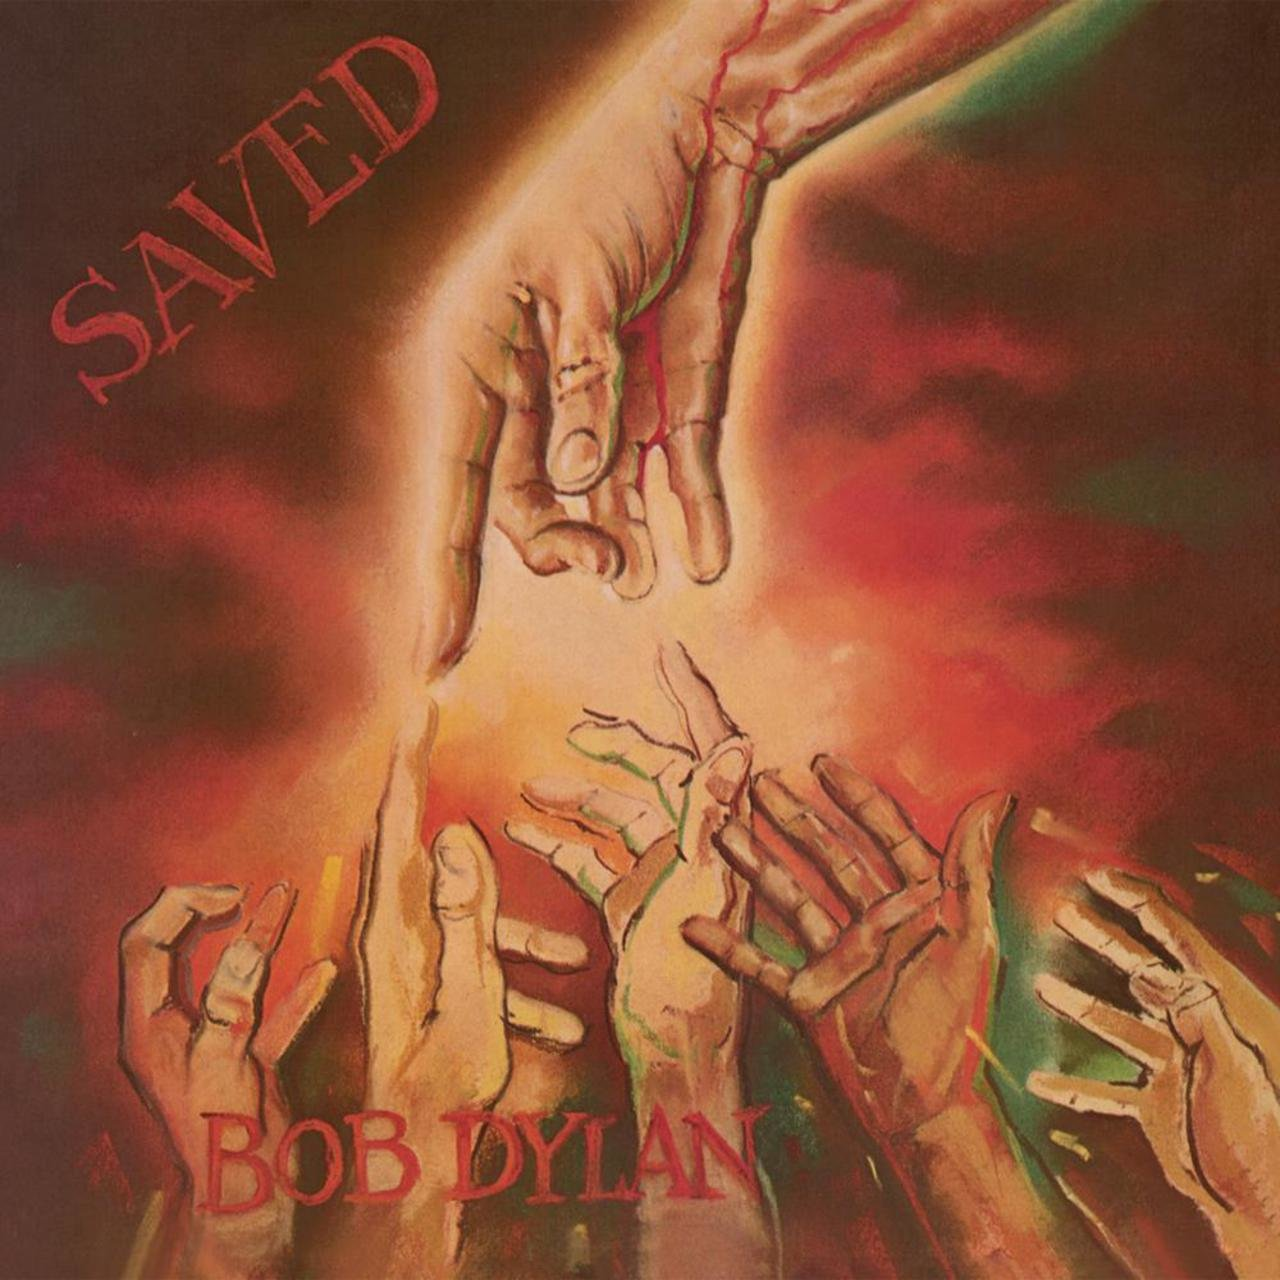 Saved (Remastered) / Bob Dylan TIDAL